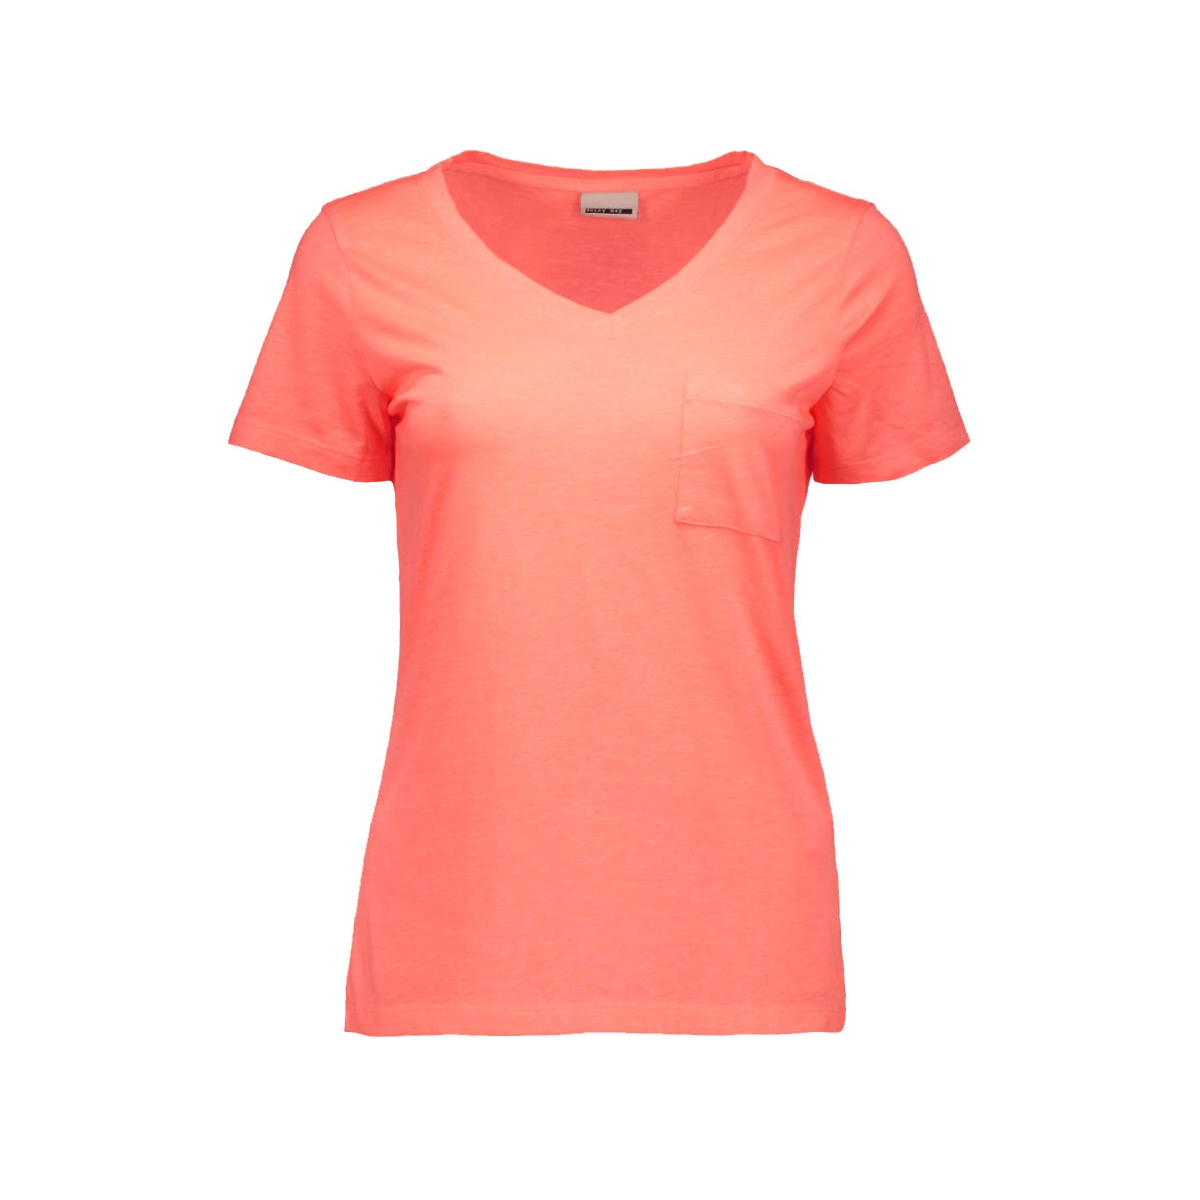 nmgila s/s top 10155359 noisy may t-shirt fiery coral